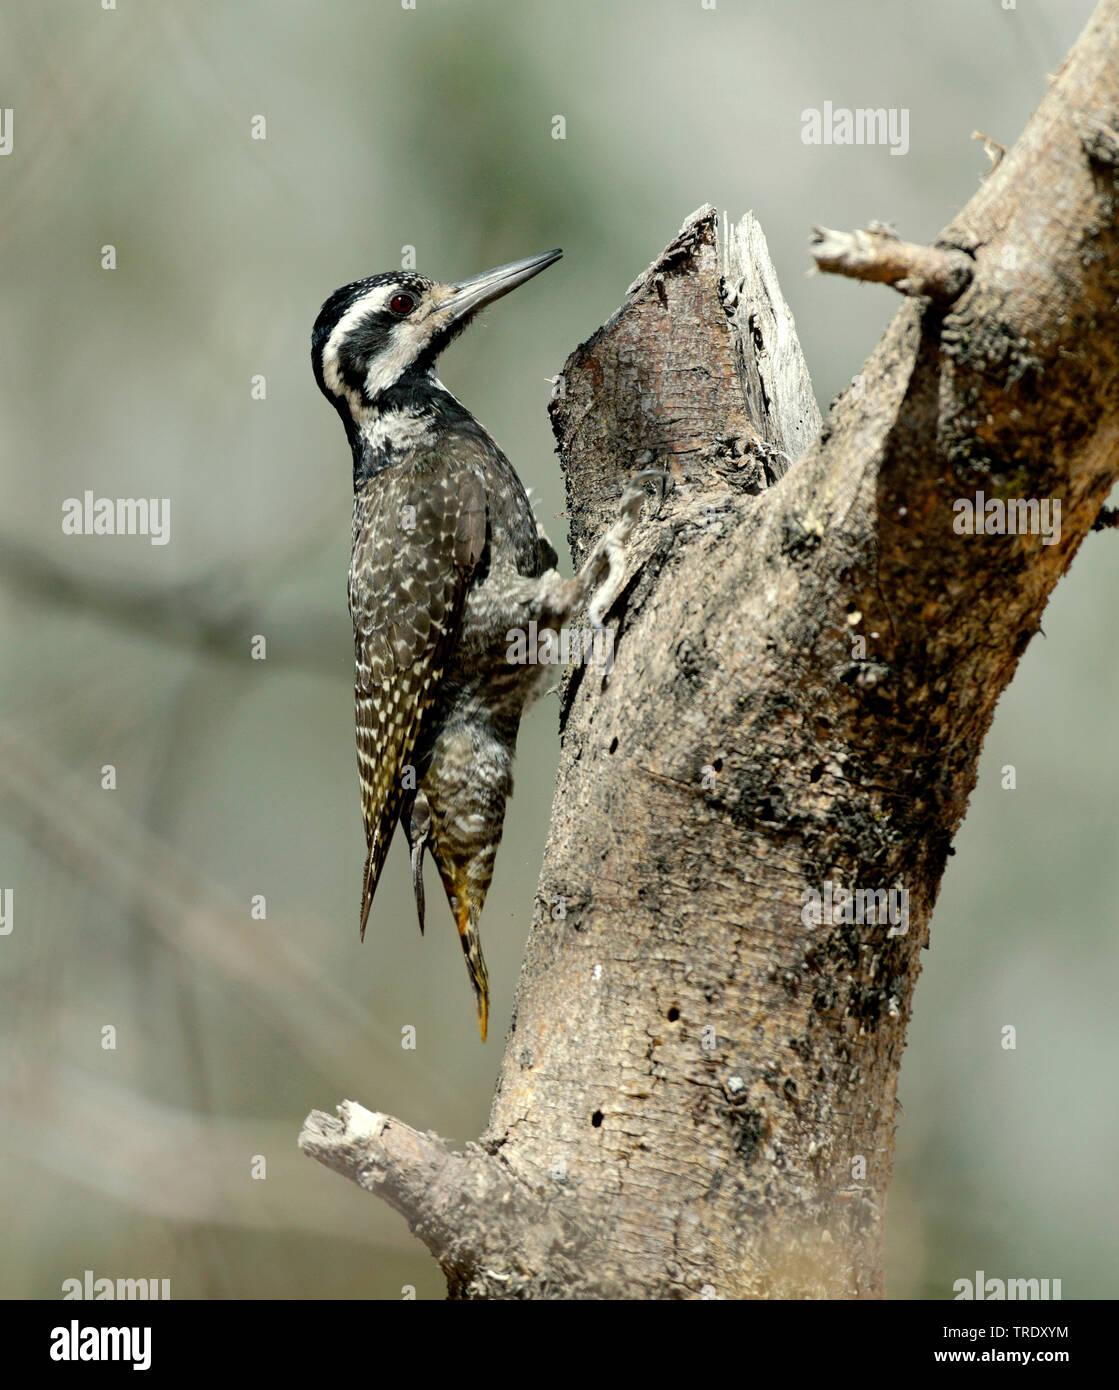 Namaspecht, Nama-Specht (Dendropicos namaquus), Weibchen sitzt auf einem Baum, Aethiopien   bearded woodpecker (Dendropicos namaquus), female sitting - Stock Image